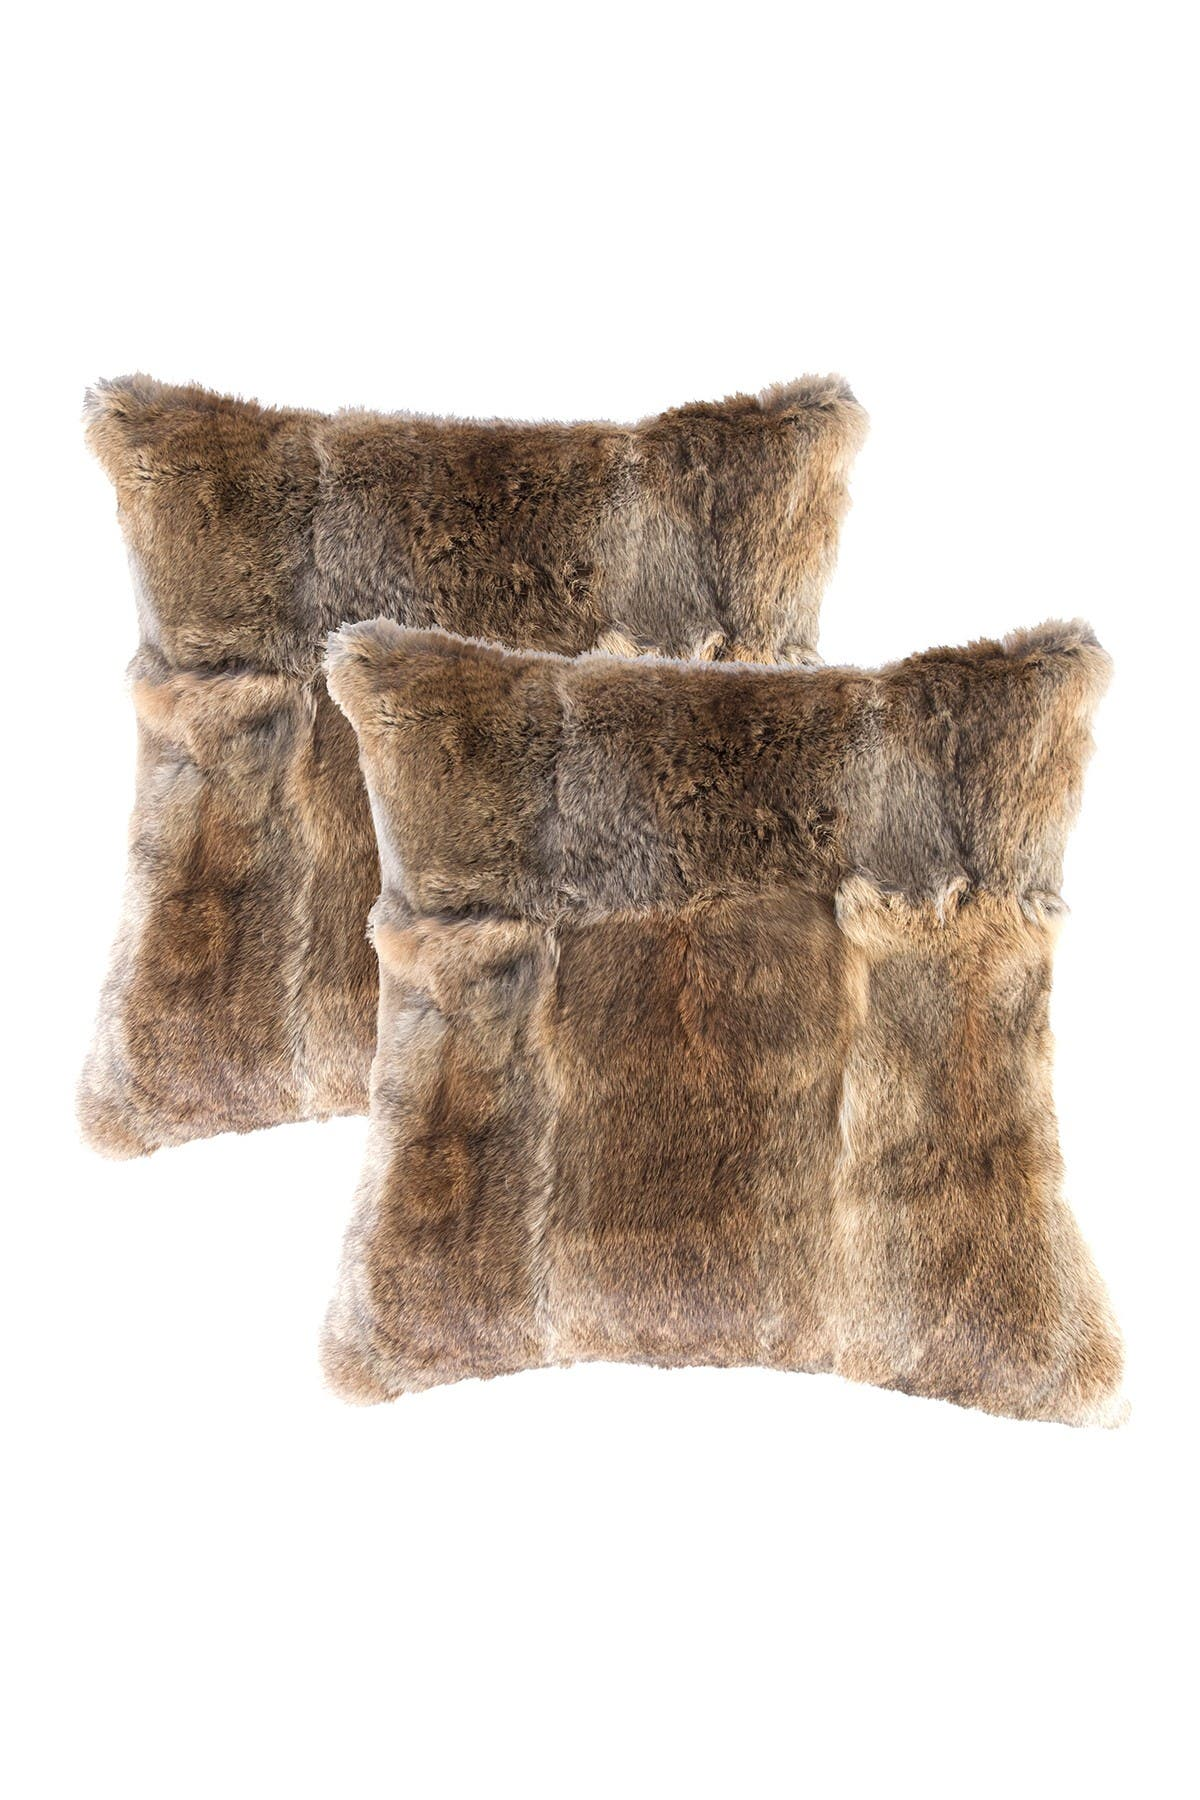 "Image of Natural Genuine Rabbit Fur Pillow - Set of 2 - 18"" x 18"" - Hazelnut"